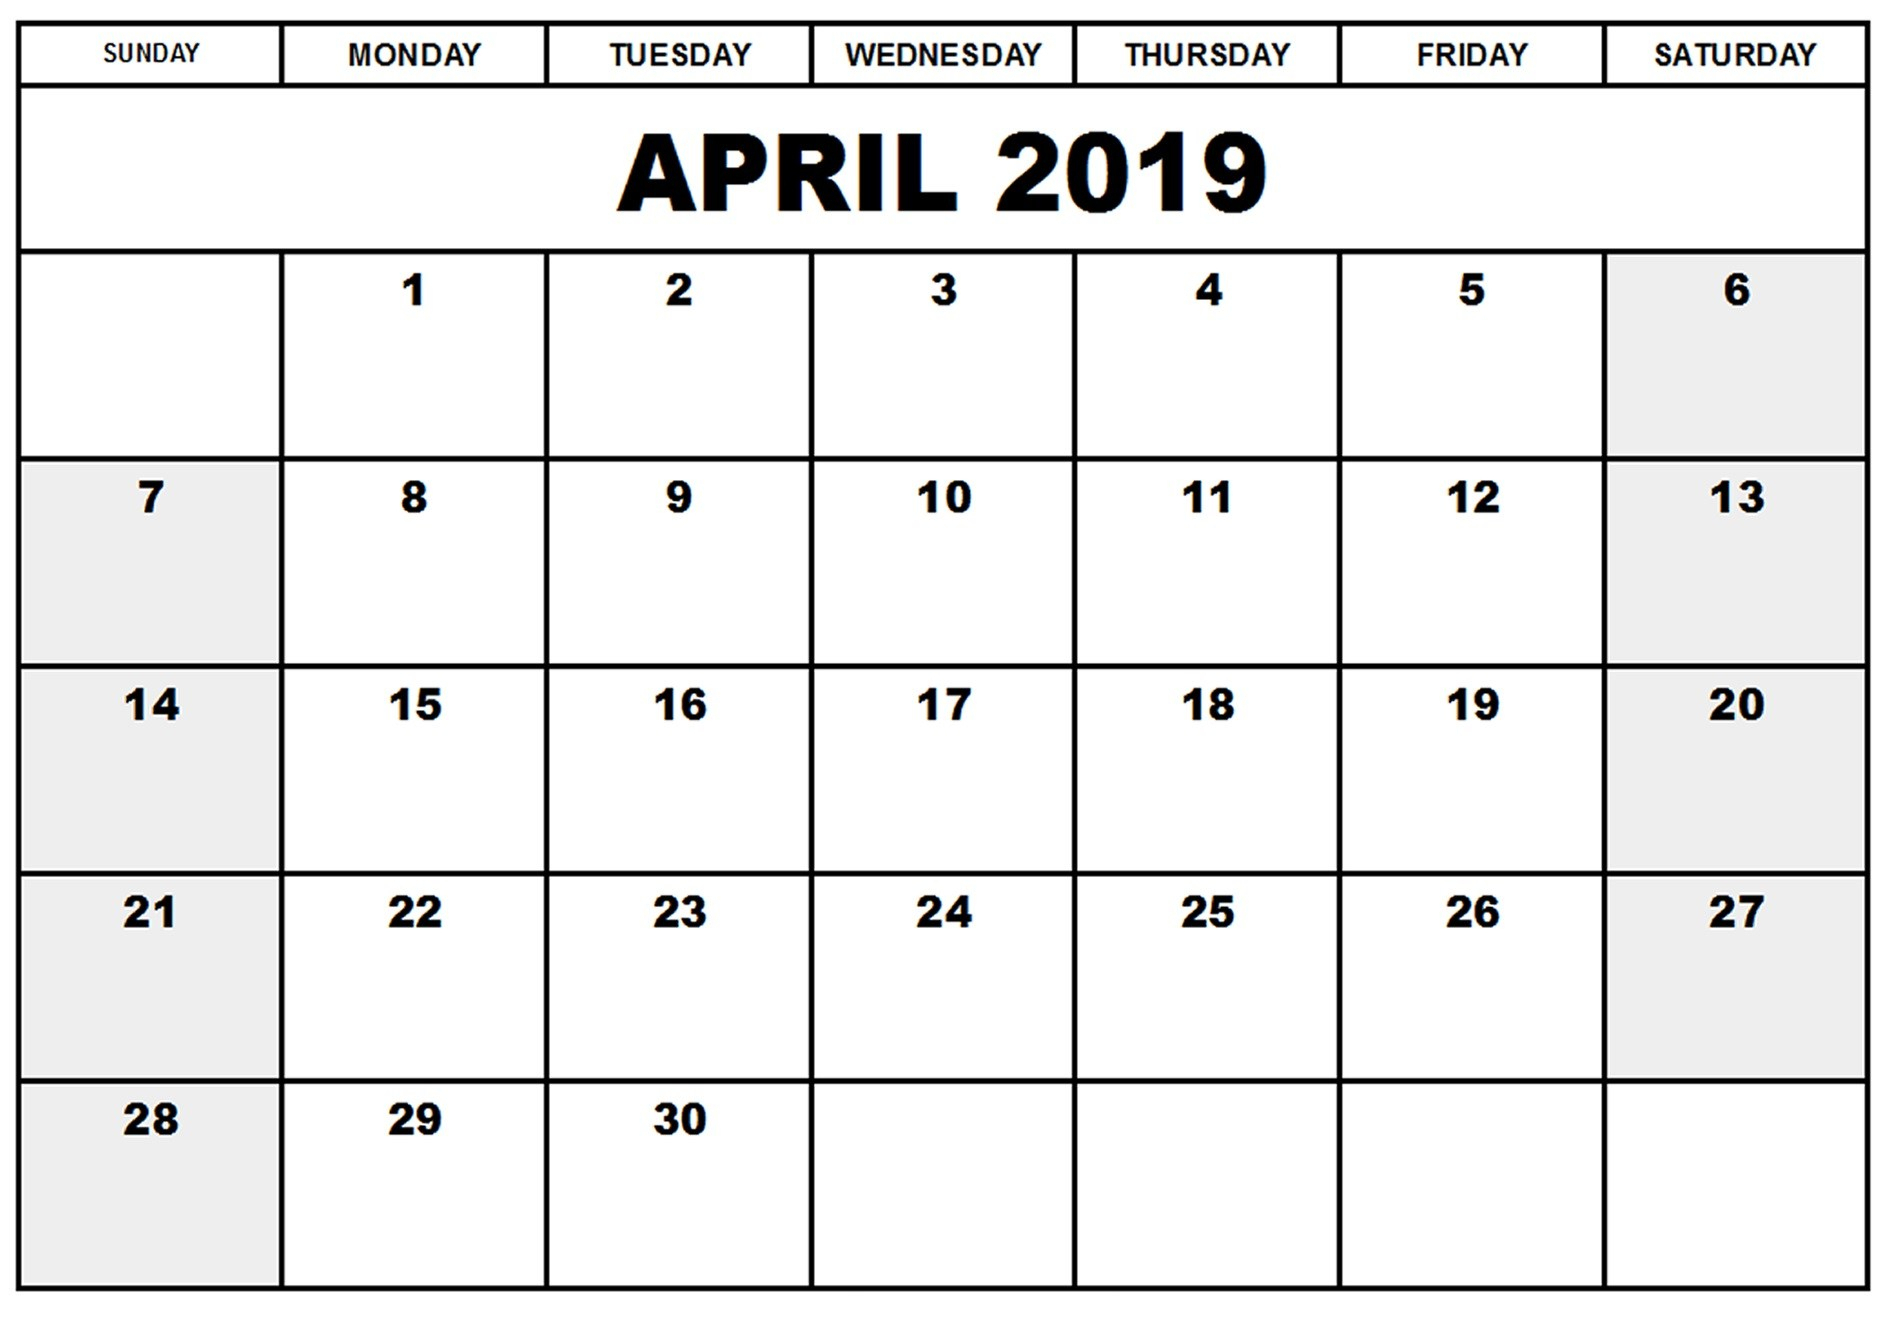 Free April 2019 Calendar Printable Blank Templates - Pdf Word within Calendar Printable Free Template